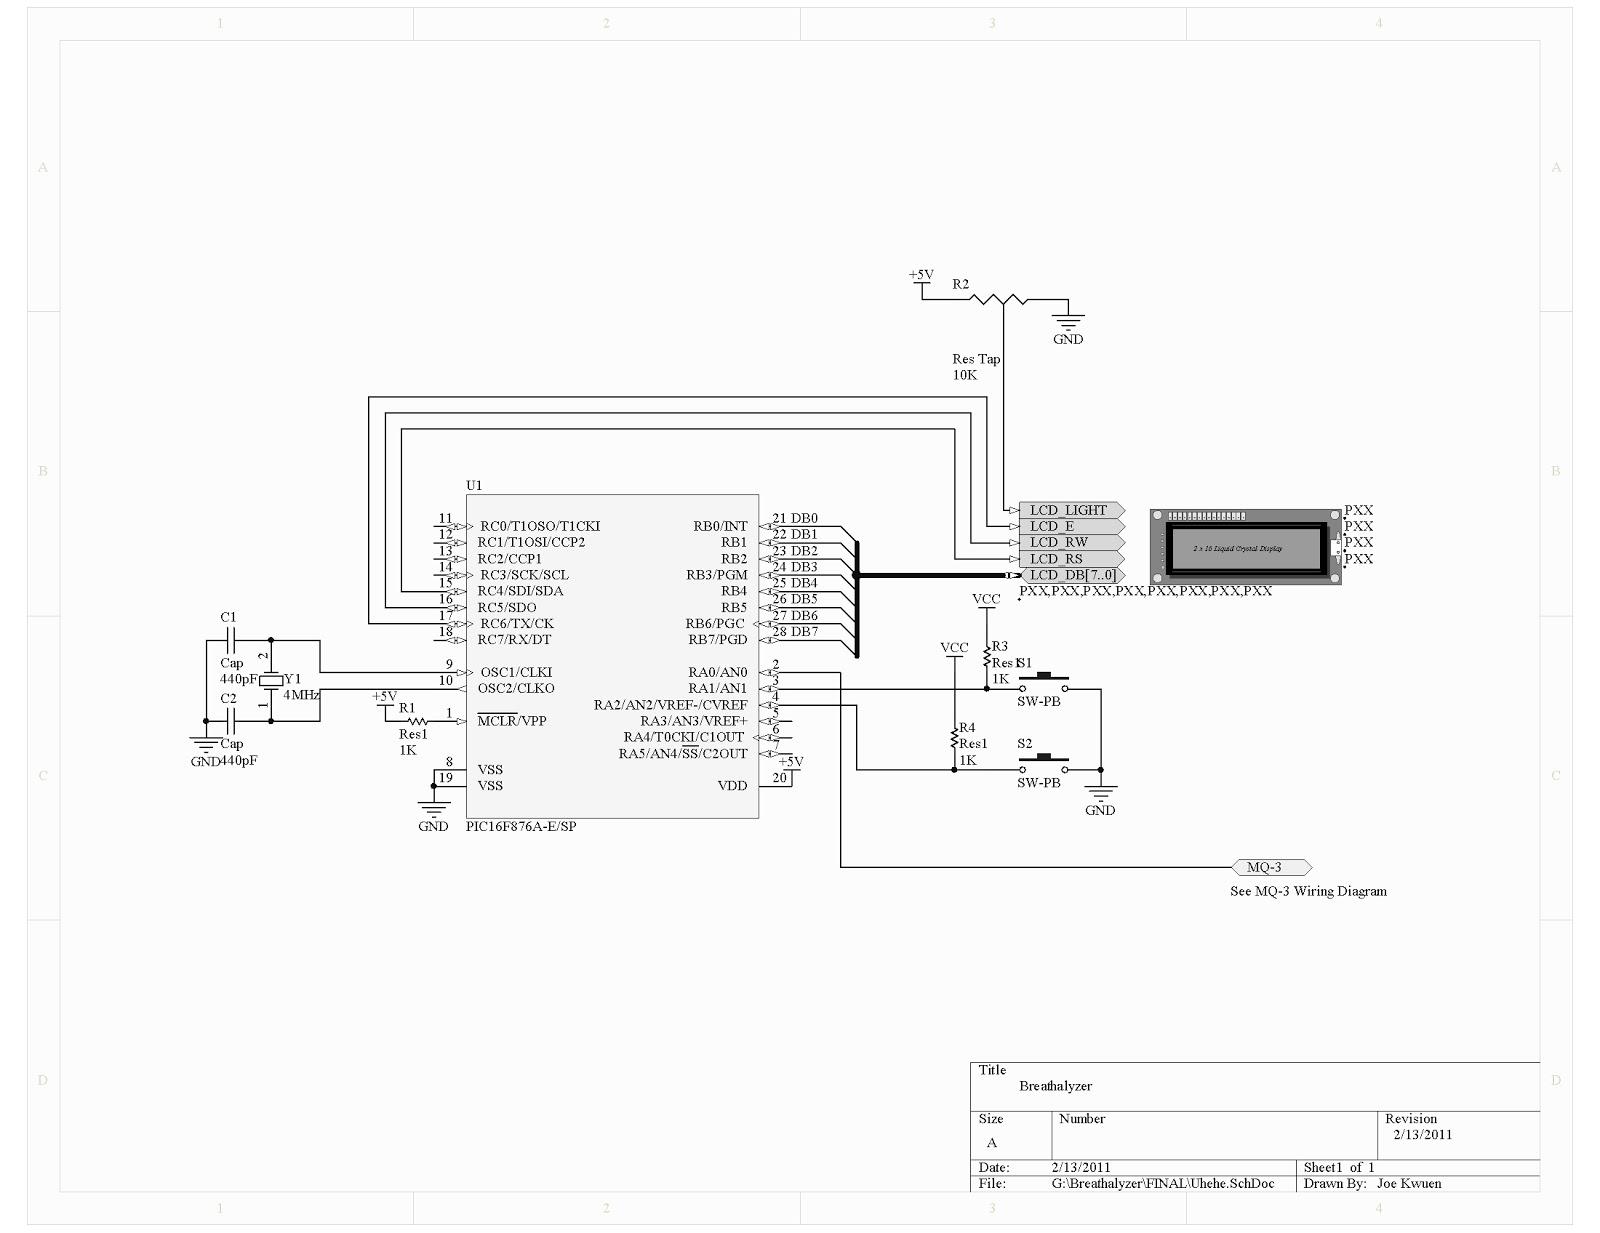 Rc4 Wiring Diagram Electrical Doorbell Circuit Basiccircuit Seekiccom Breathalyzer Basic U2022 Series And Parallel Circuits Diagrams